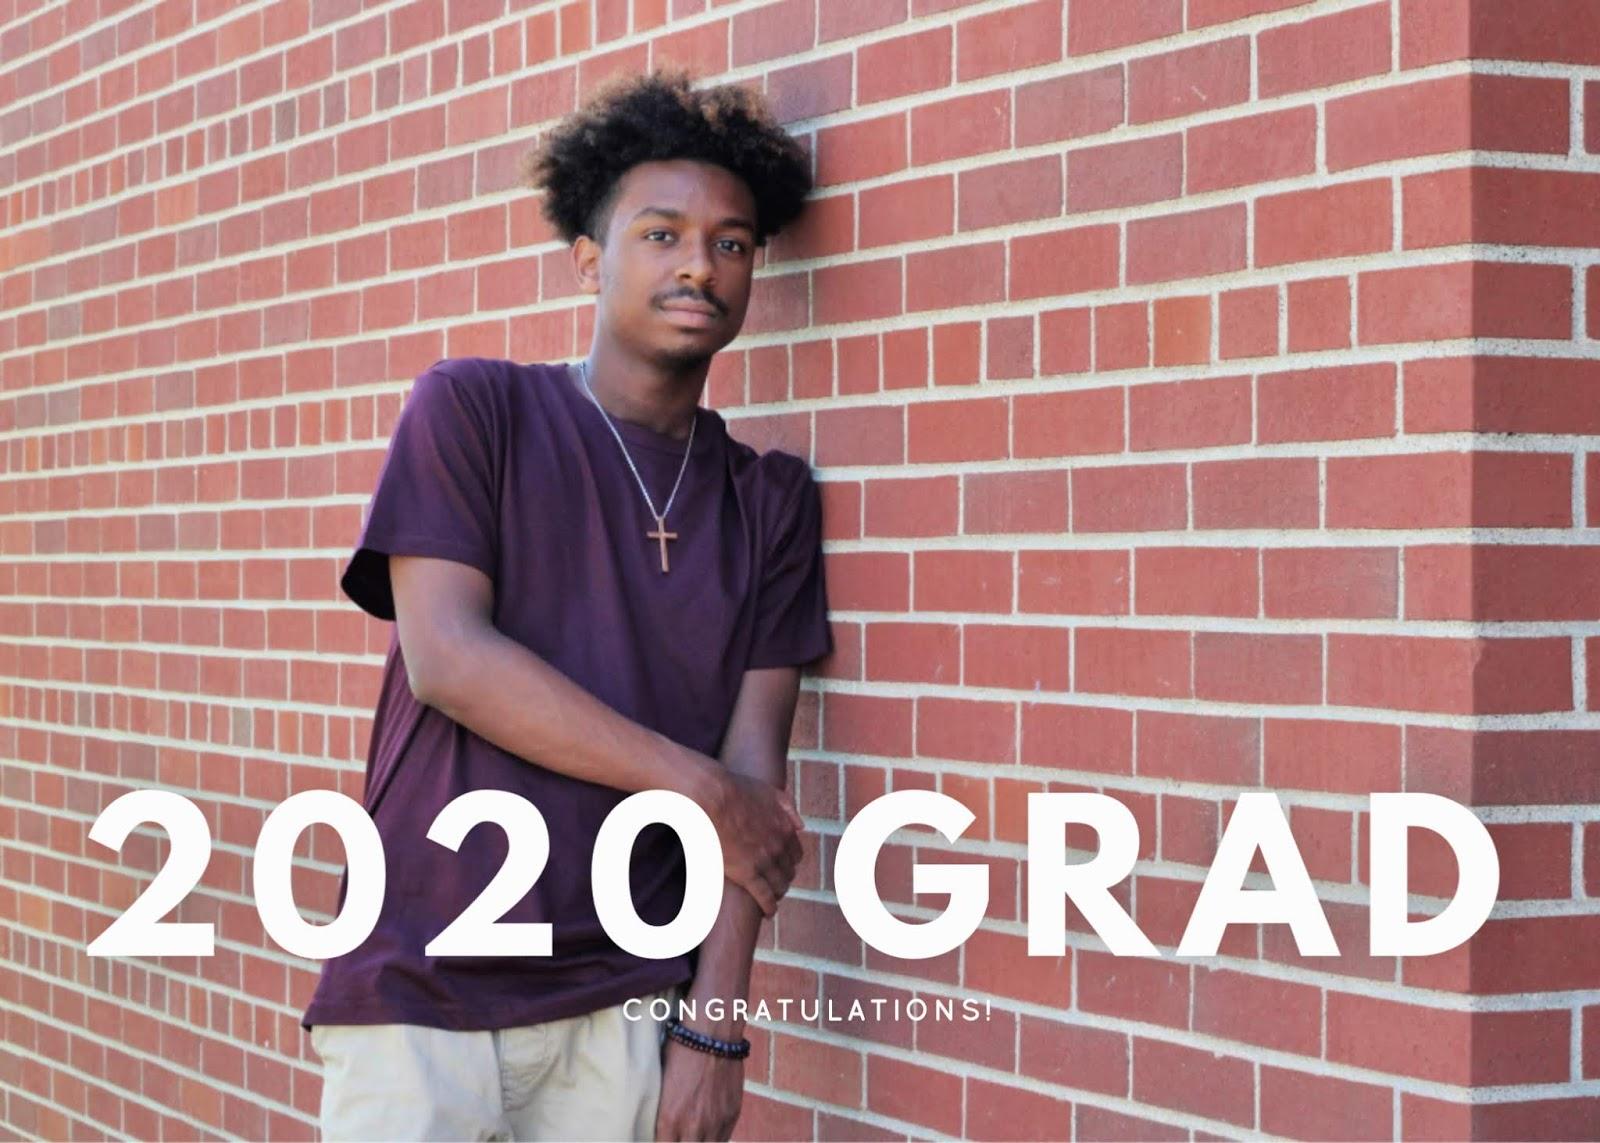 a 2020 high school graduate standing by a brick wall